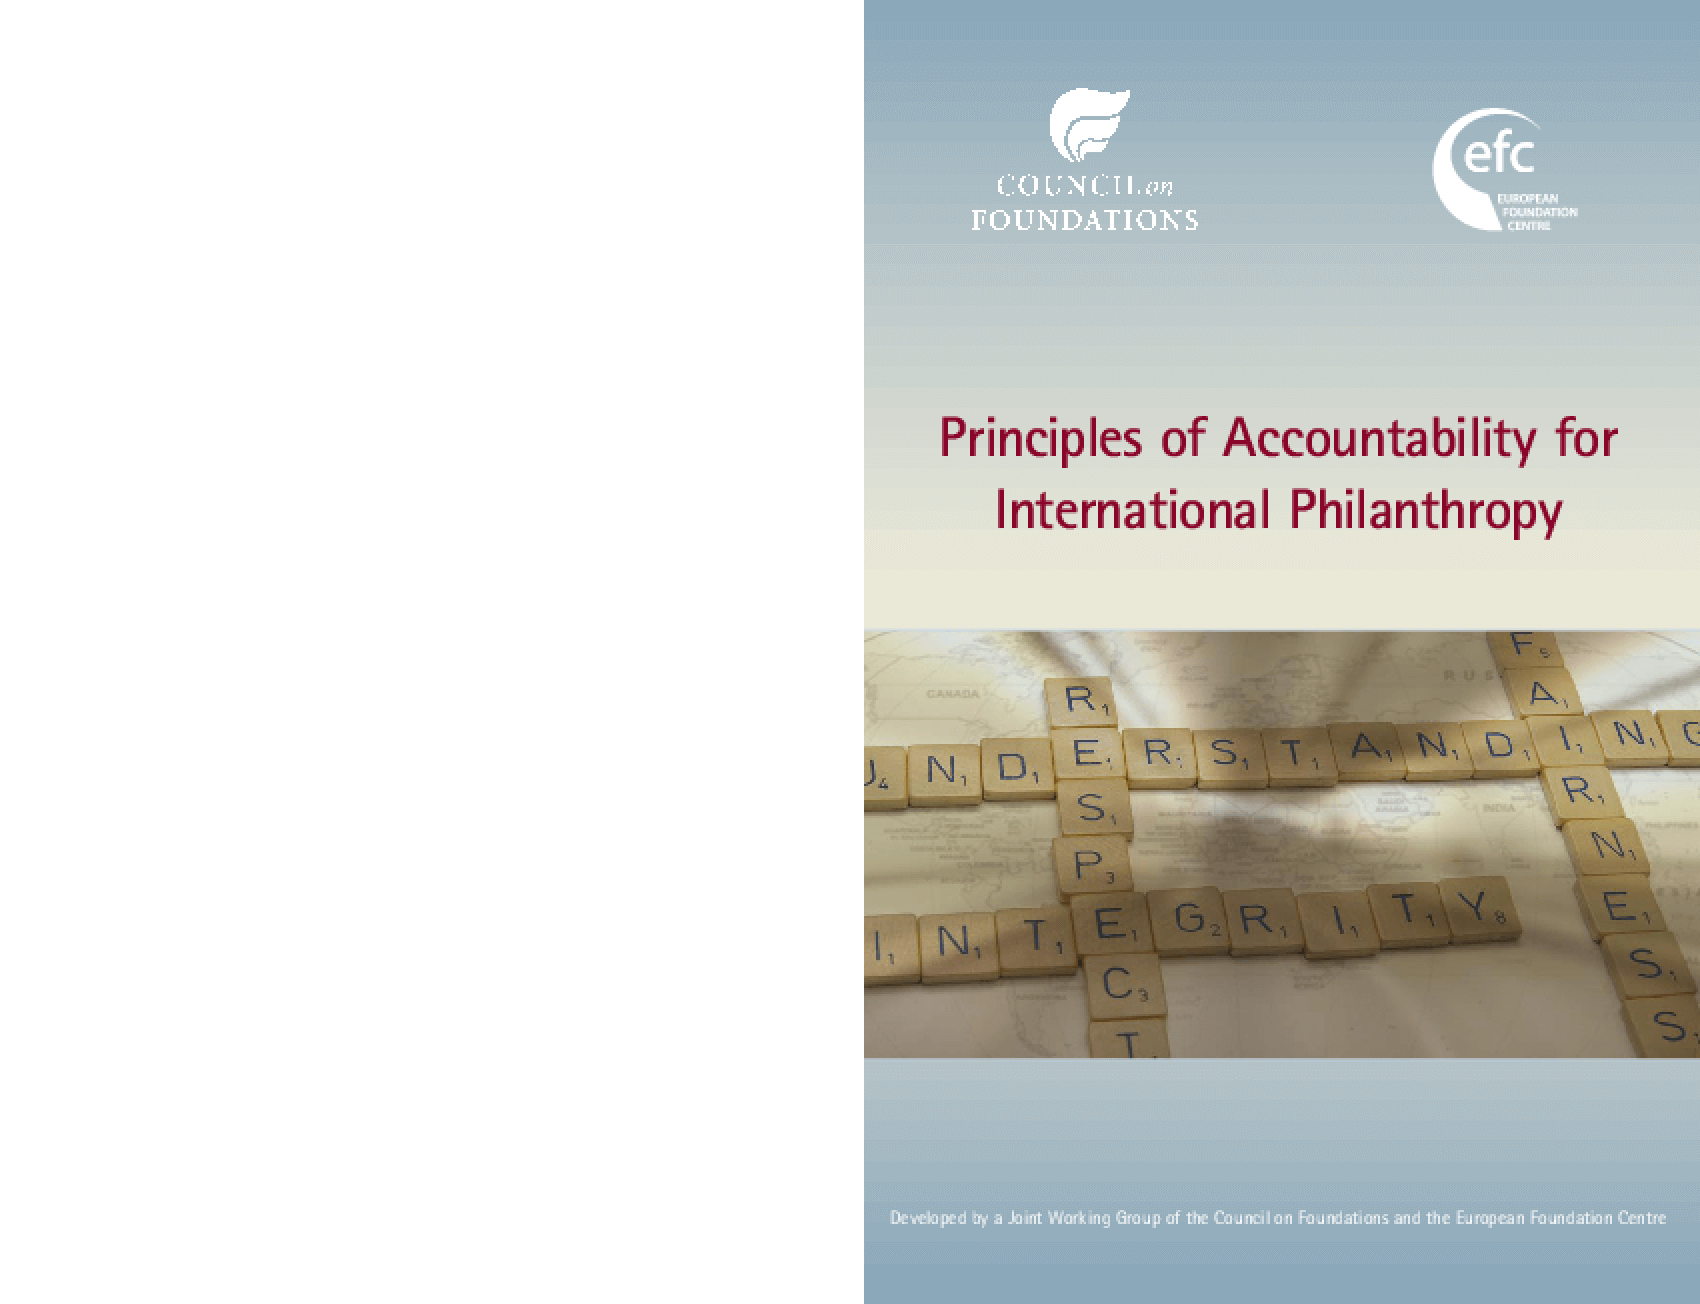 Principles of Accountability for International Philanthropy